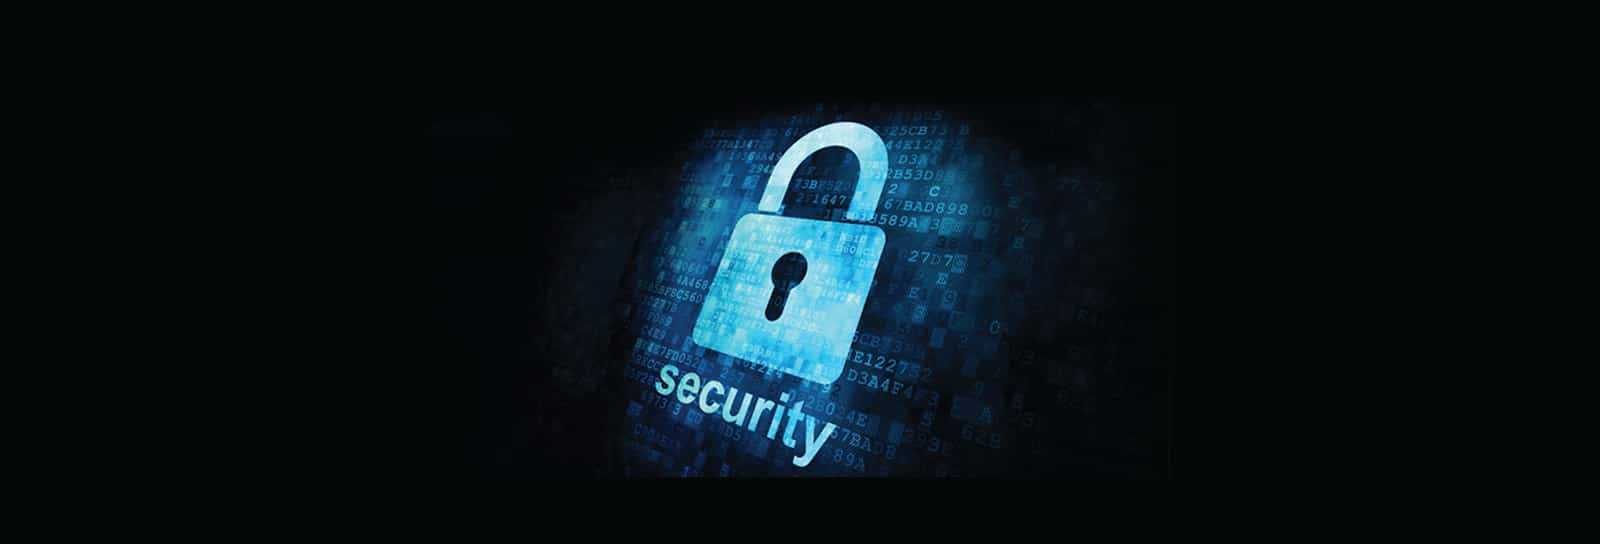 Server security management